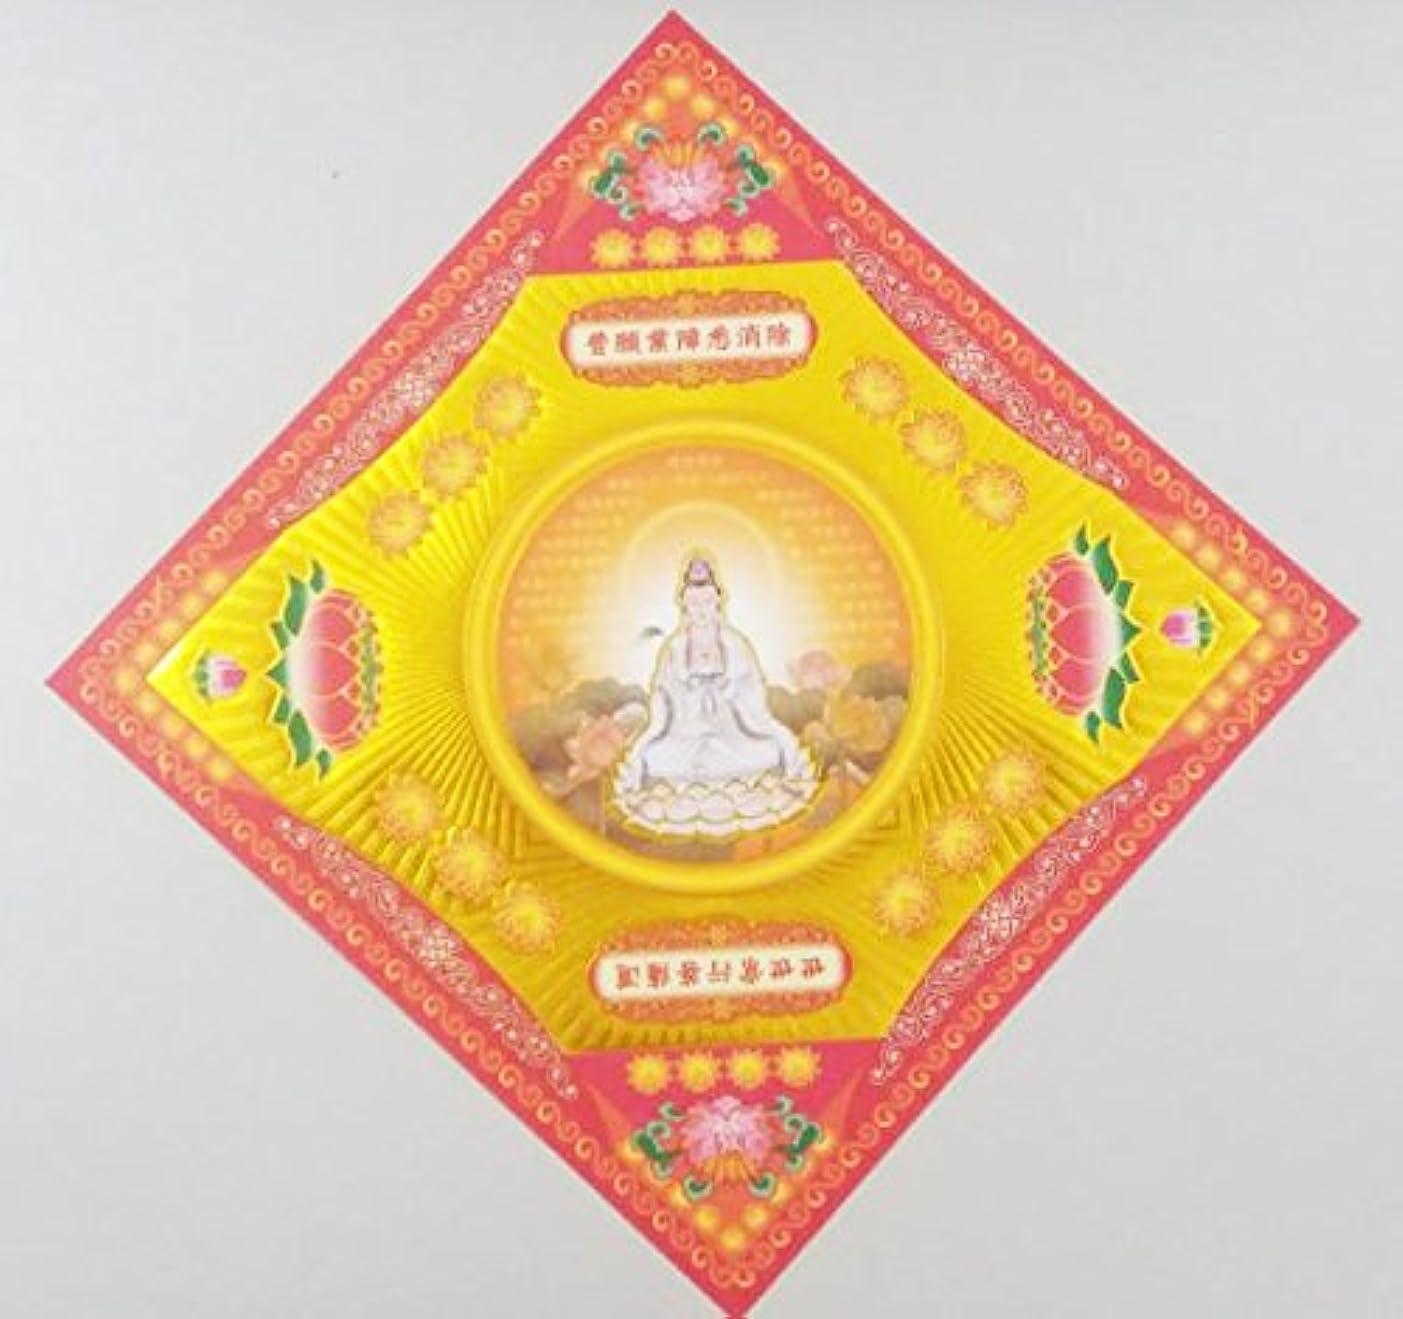 40pcs Incense用紙/Joss用紙ハイグレードGuanyinゴールドの箔の祖先Praying 8インチx 8インチ(レッド)